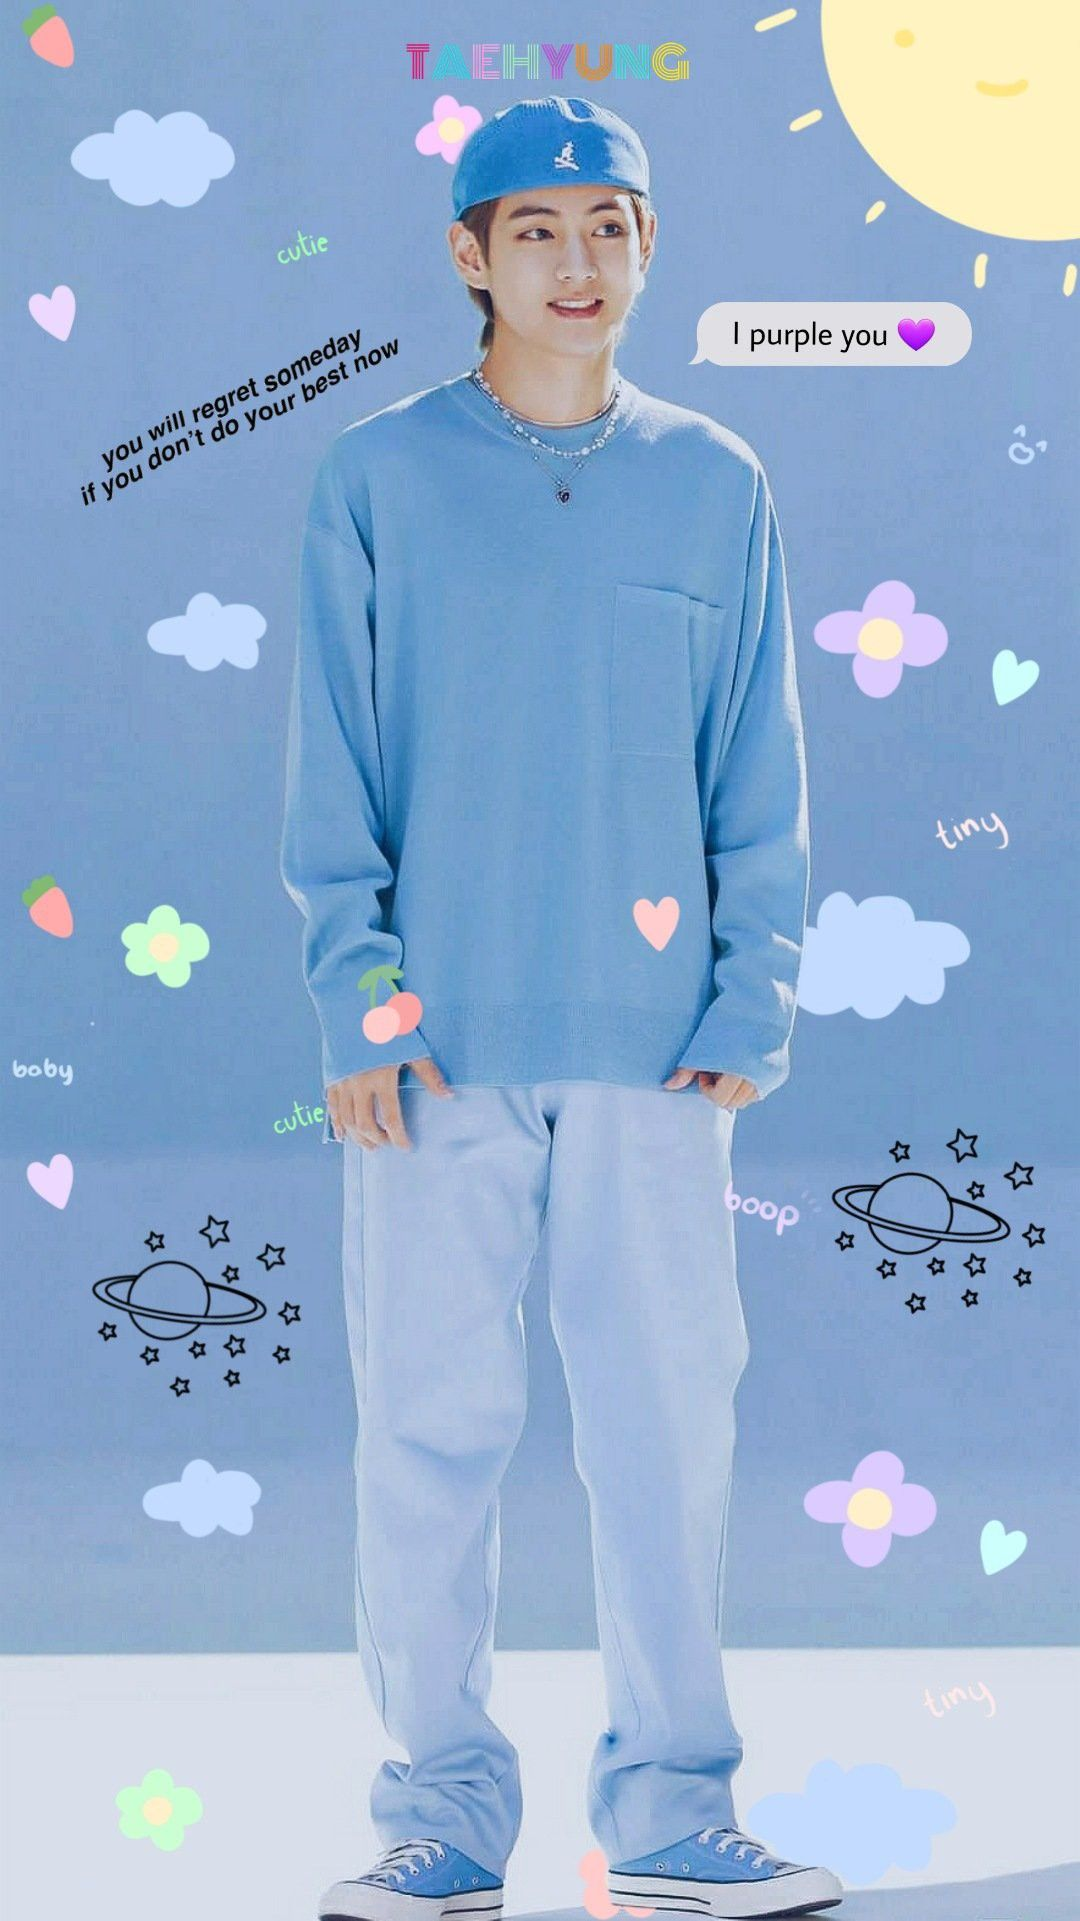 Taehyung Wallpaper   Wallpaper lucu, Orang lucu, Sangat lucu